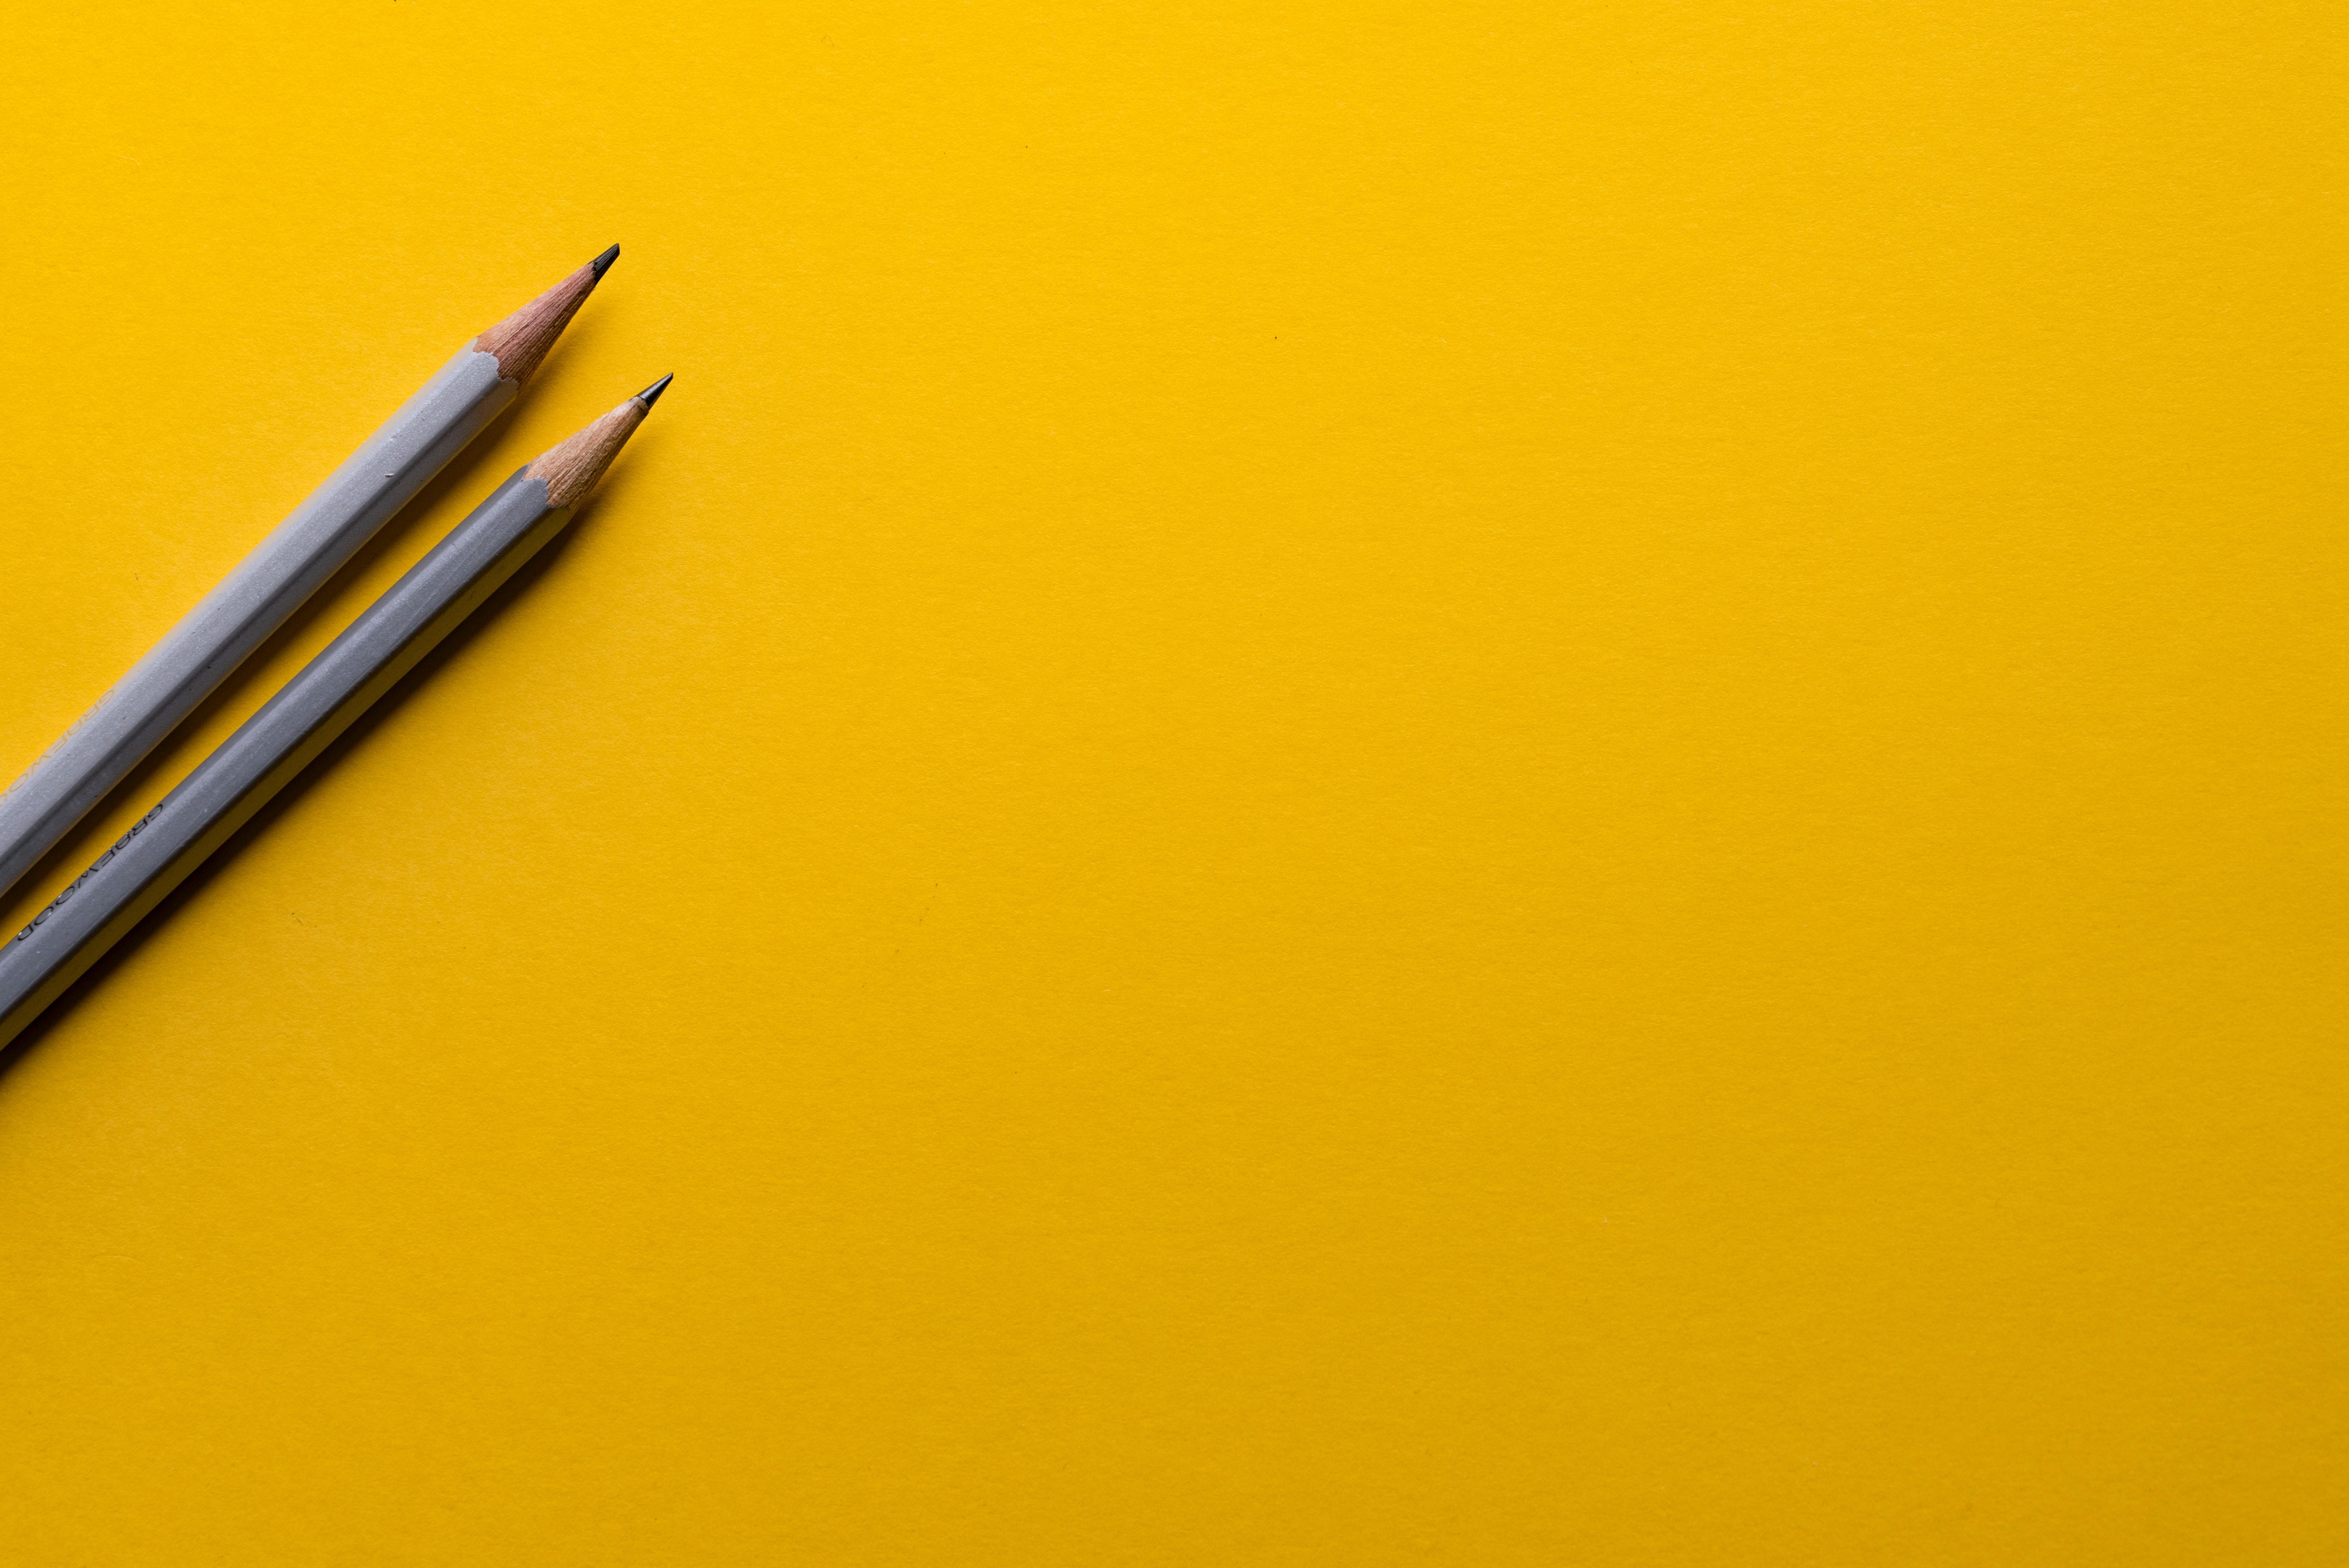 Карандаши на желтом карандаши